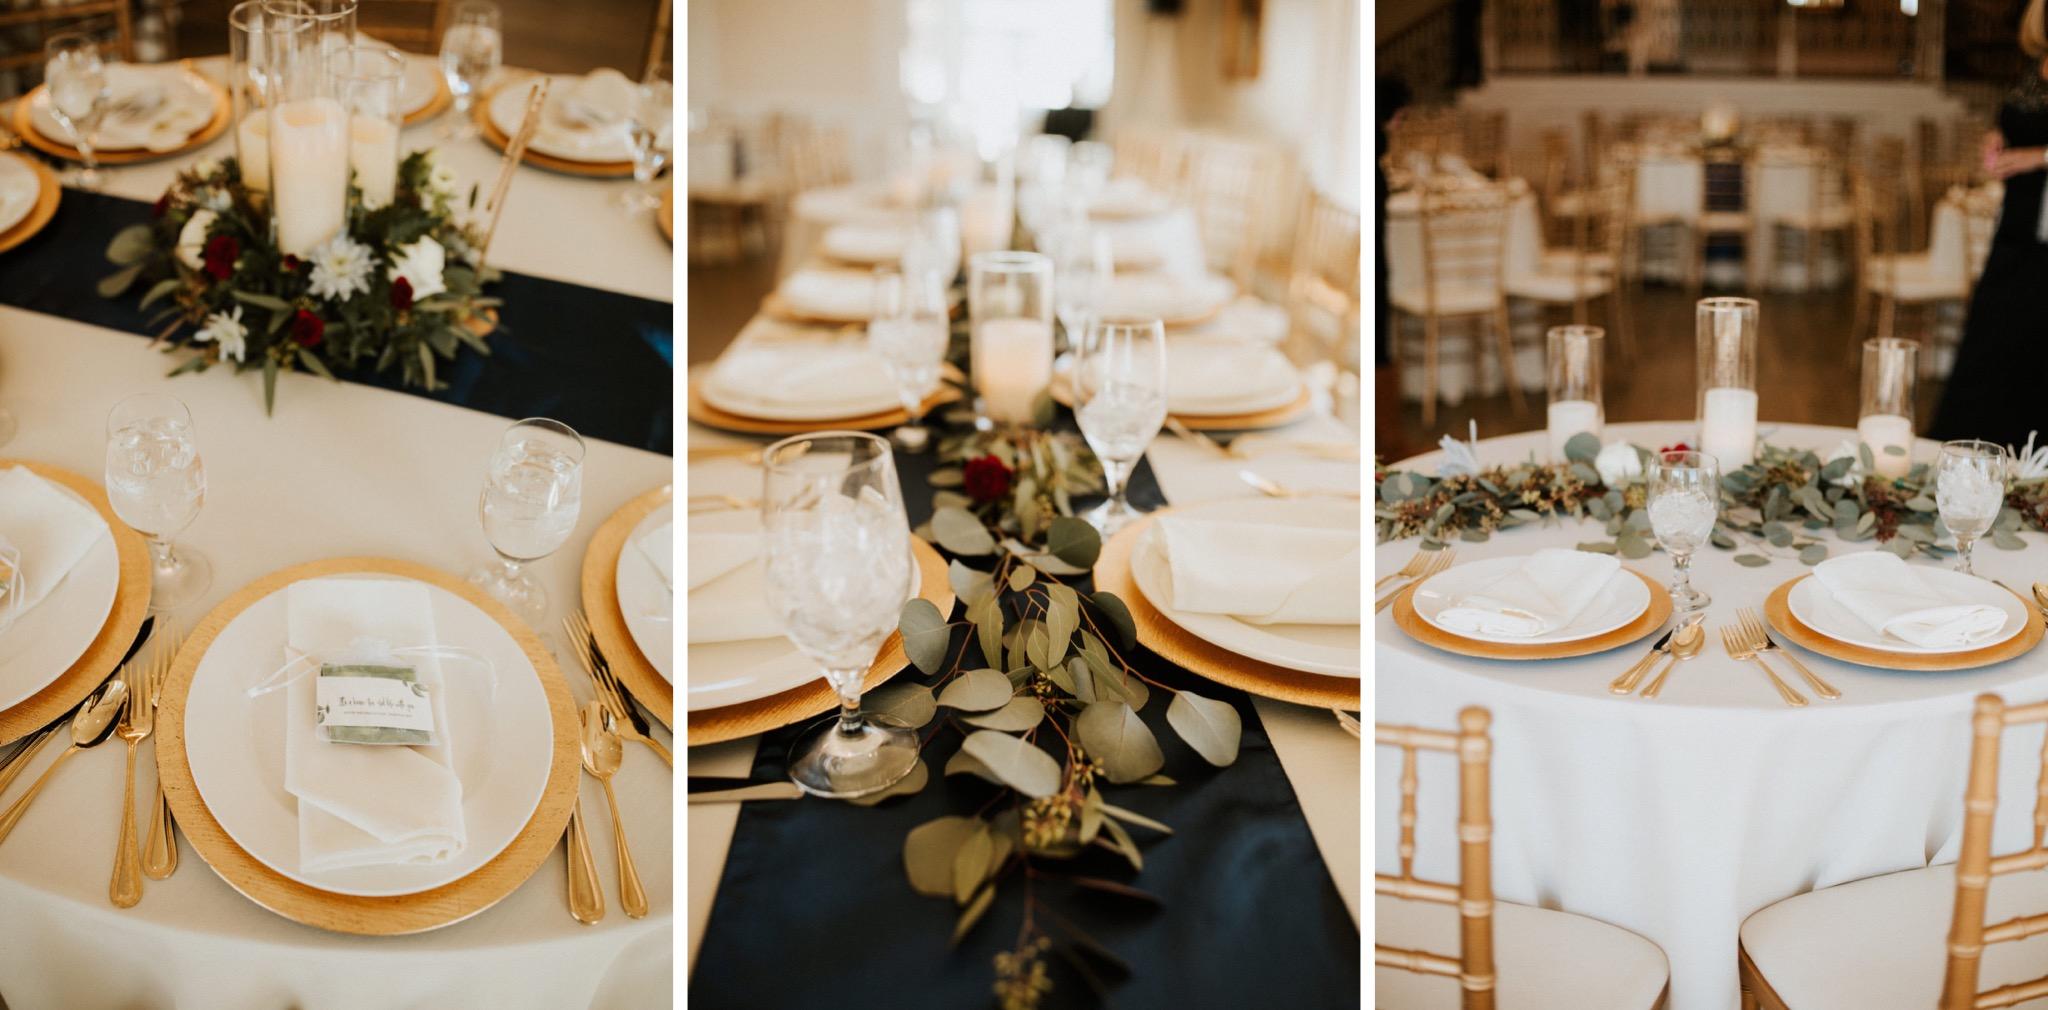 37_West Manor Estate Weddings - Pat Cori Photography-80_West Manor Estate Weddings - Pat Cori Photography-83_West Manor Estate Weddings - Pat Cori Photography-81_details_VirginiaWeddingPhotographer_WestManorEstate_reception_PatCoriPhotography.jpg